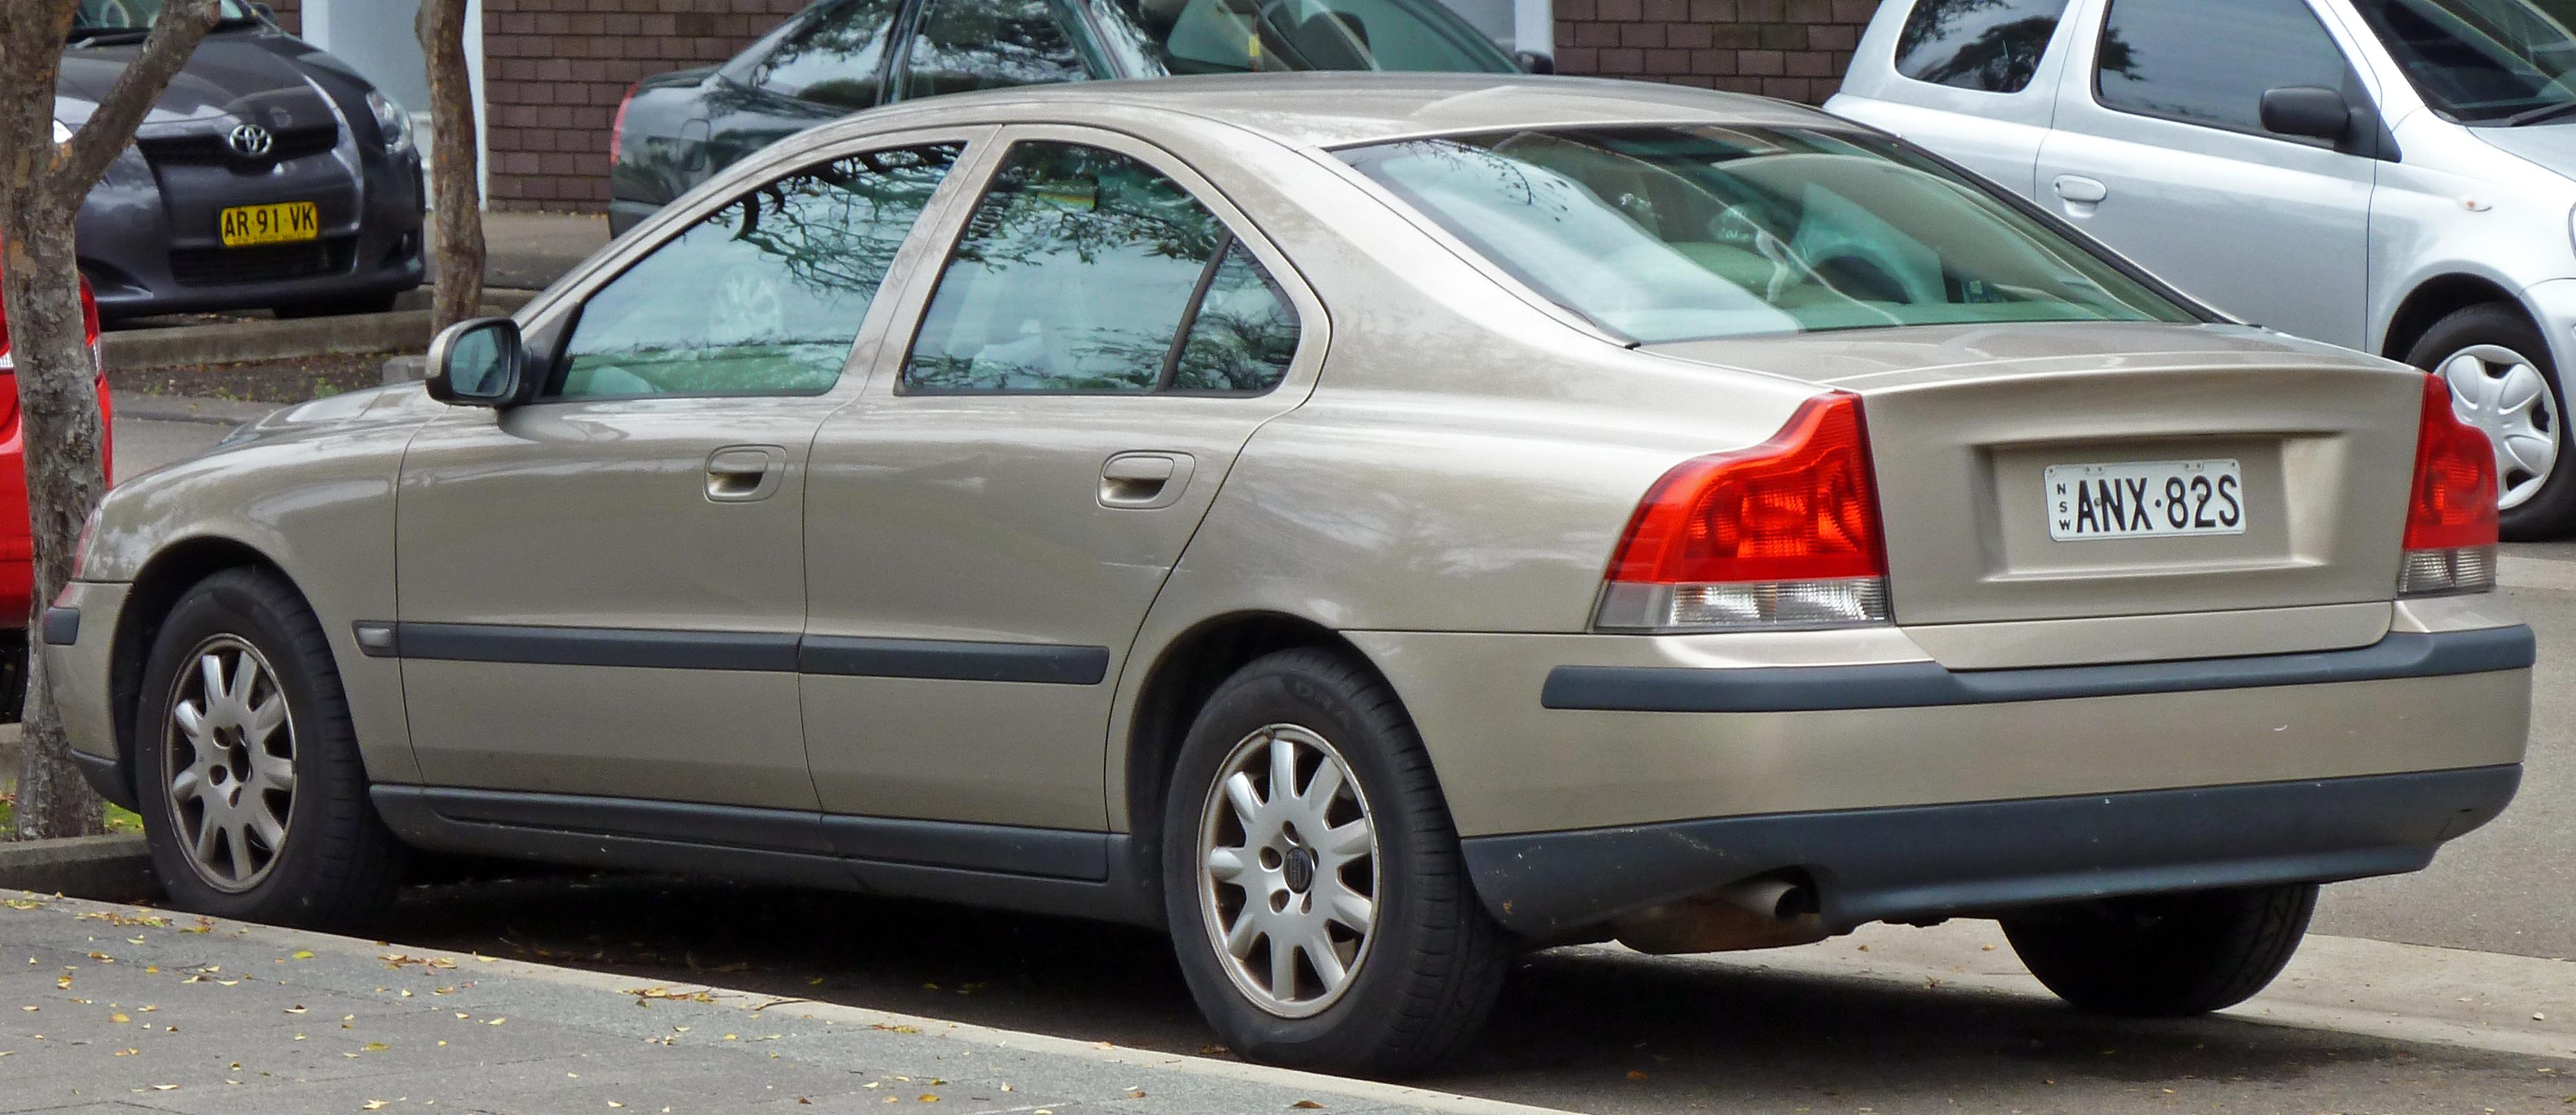 File:2000-2004 Volvo S60 sedan 02.jpg - Wikimedia Commons